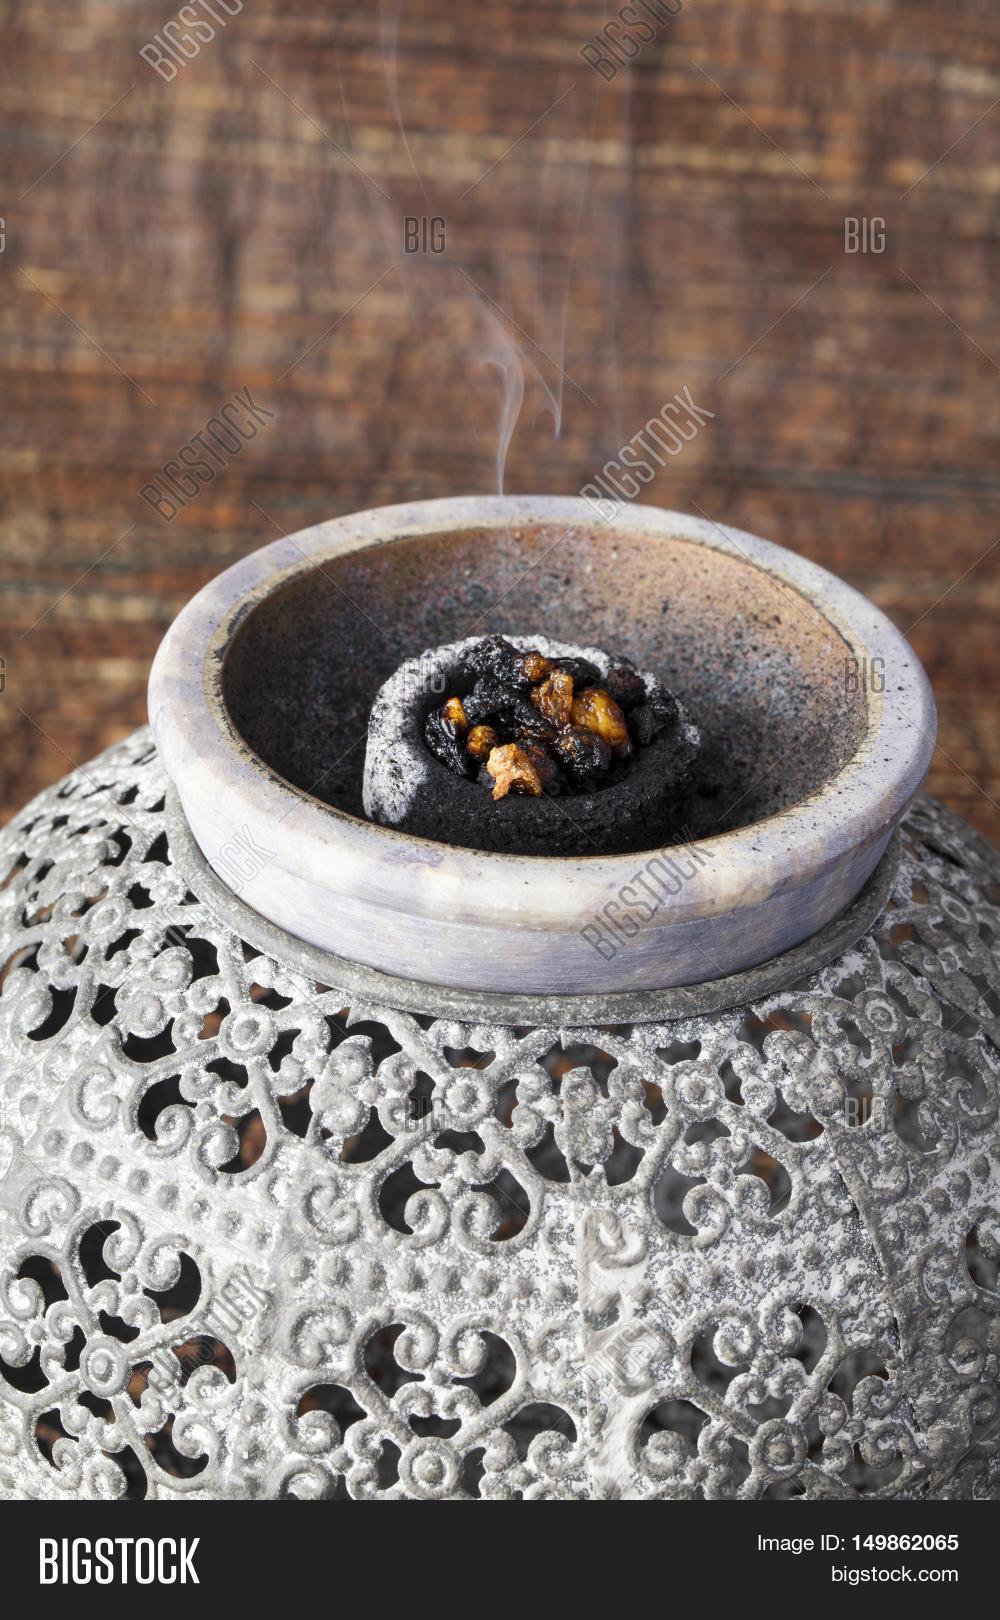 Myrrh Burning On Hot Image Photo Free Trial Bigstock